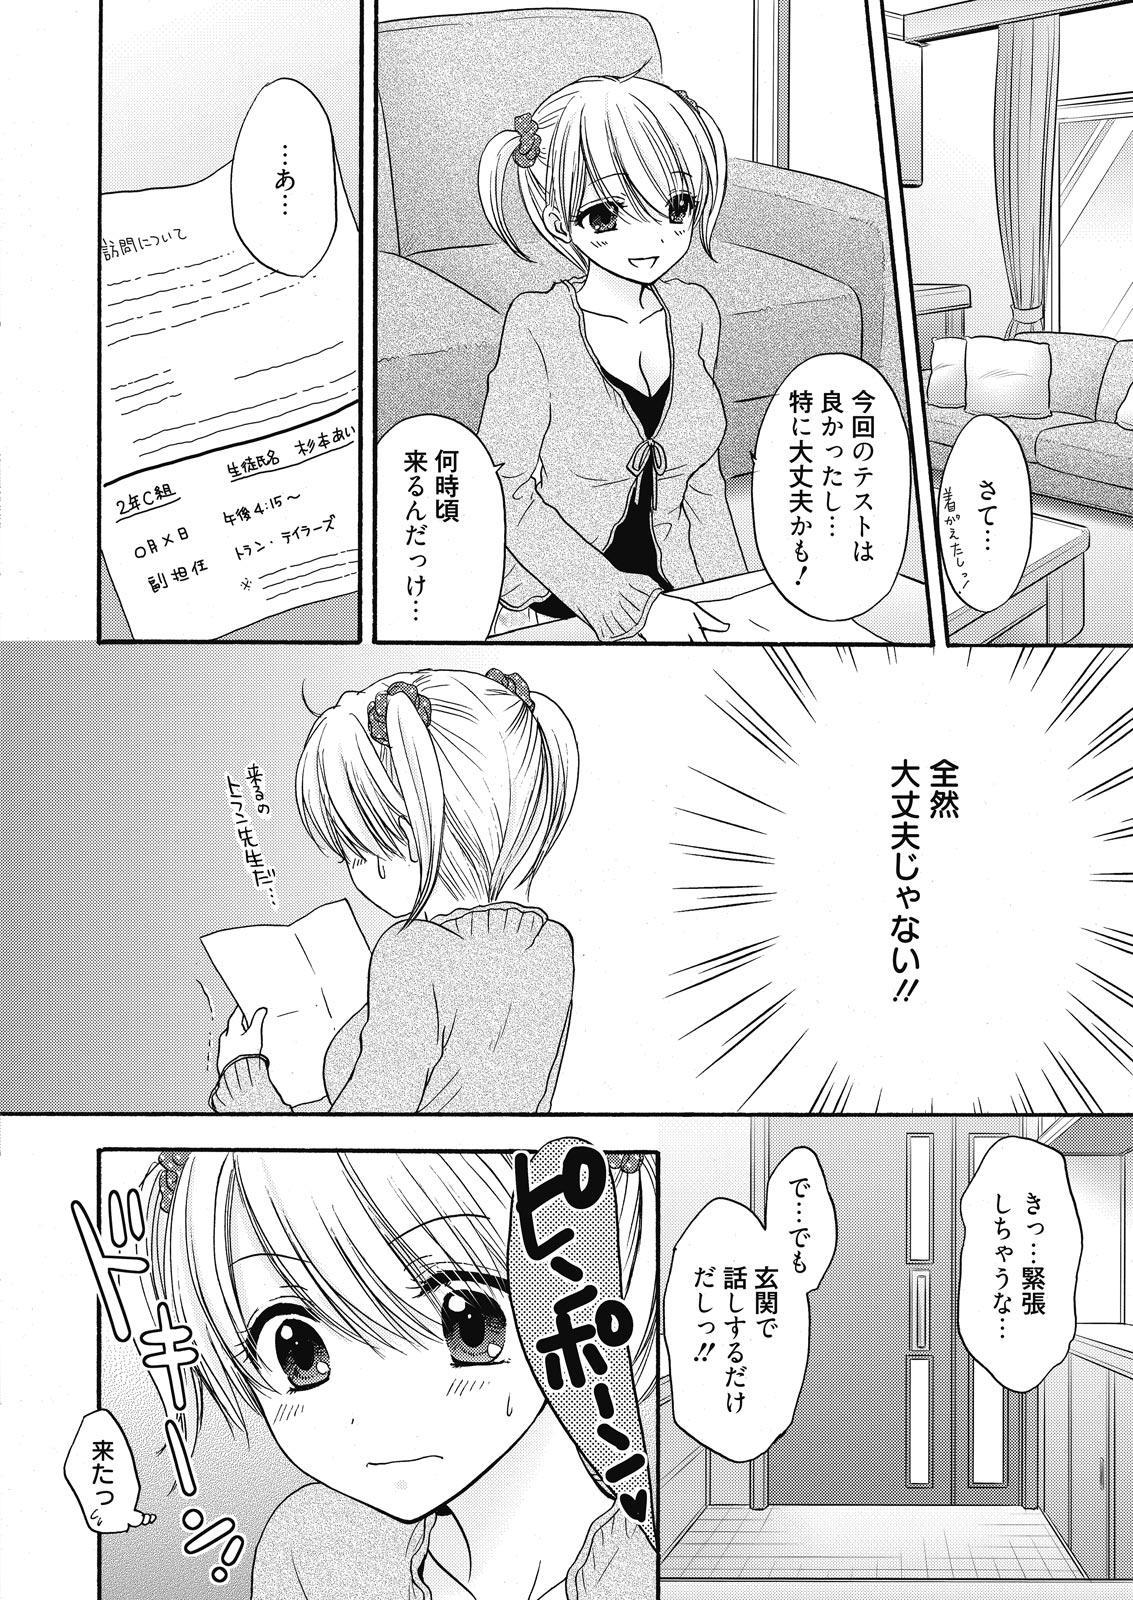 Web Manga Bangaichi Vol. 7 29